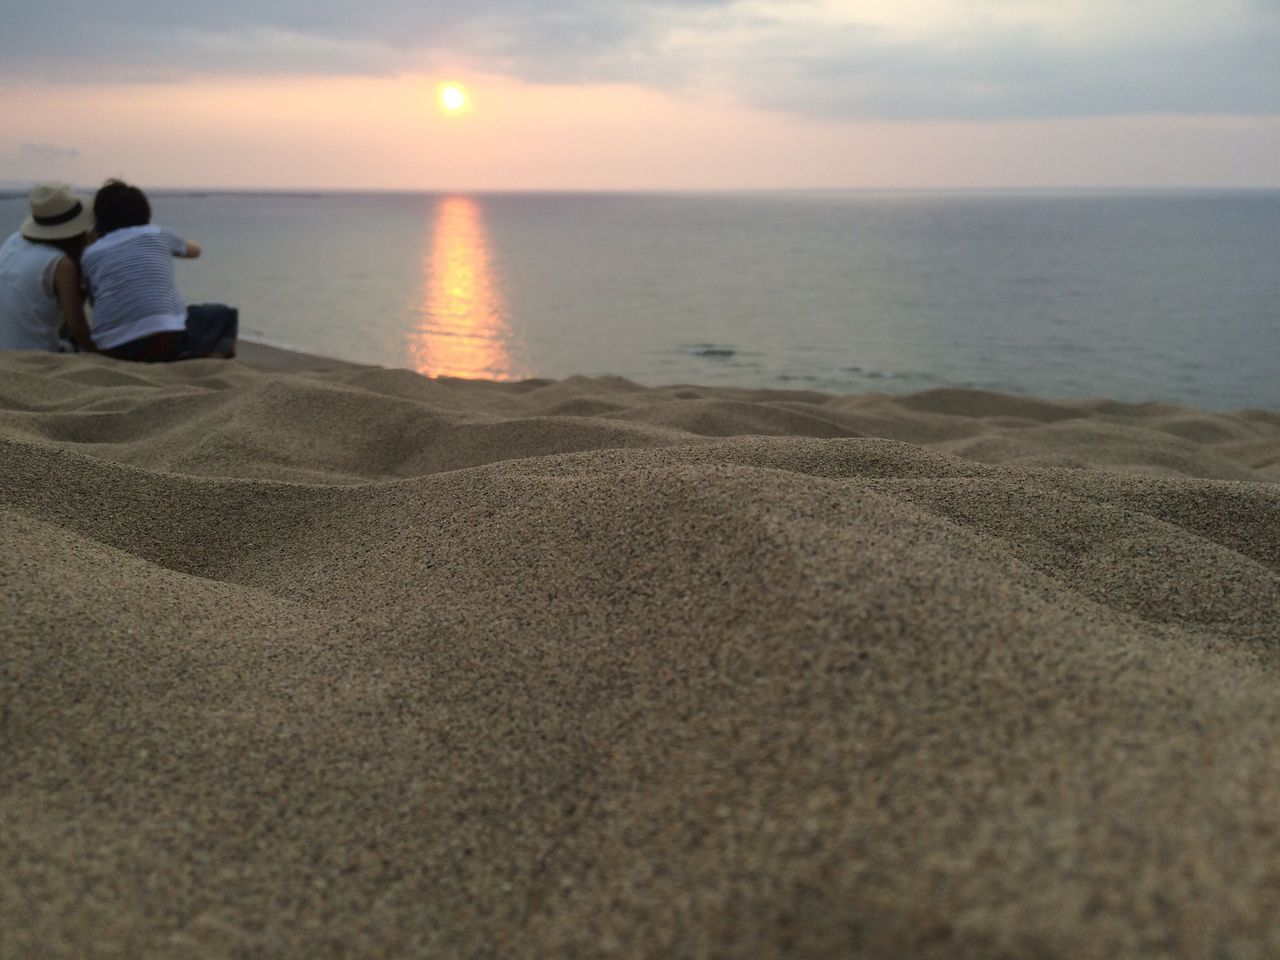 Enjoying Life Couples Shoot Sunset Dunes And Beach ☀️